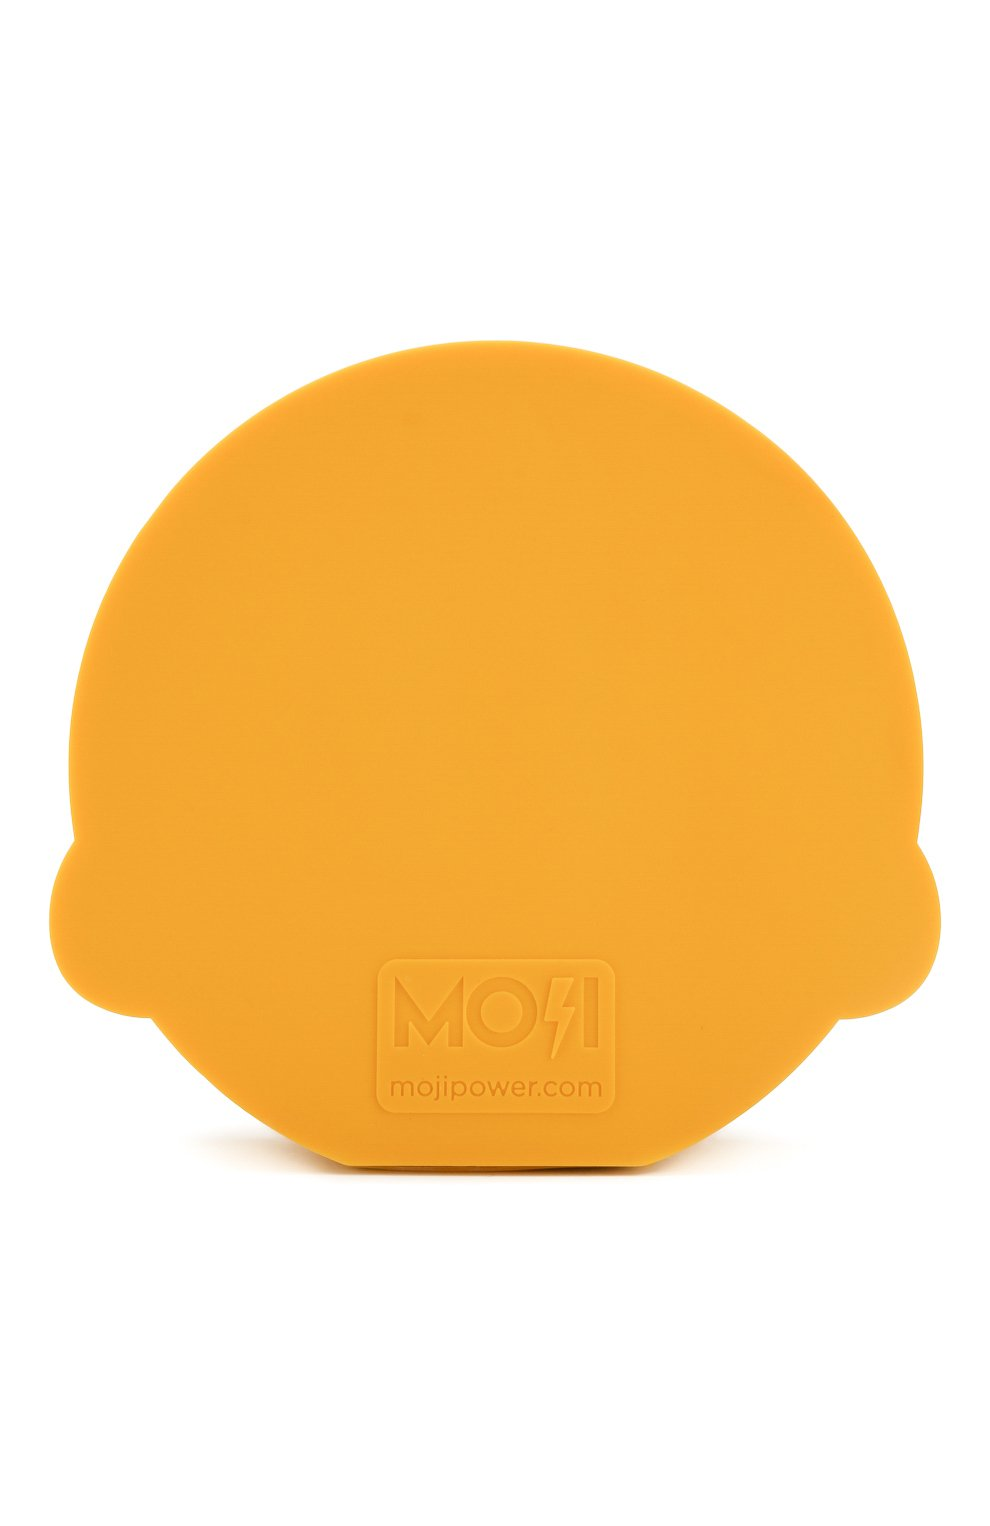 Портативный аккумулятор joy MOJI POWER желтого цвета, арт. MP001JO   Фото 2 (Статус проверки: Проверена категория)